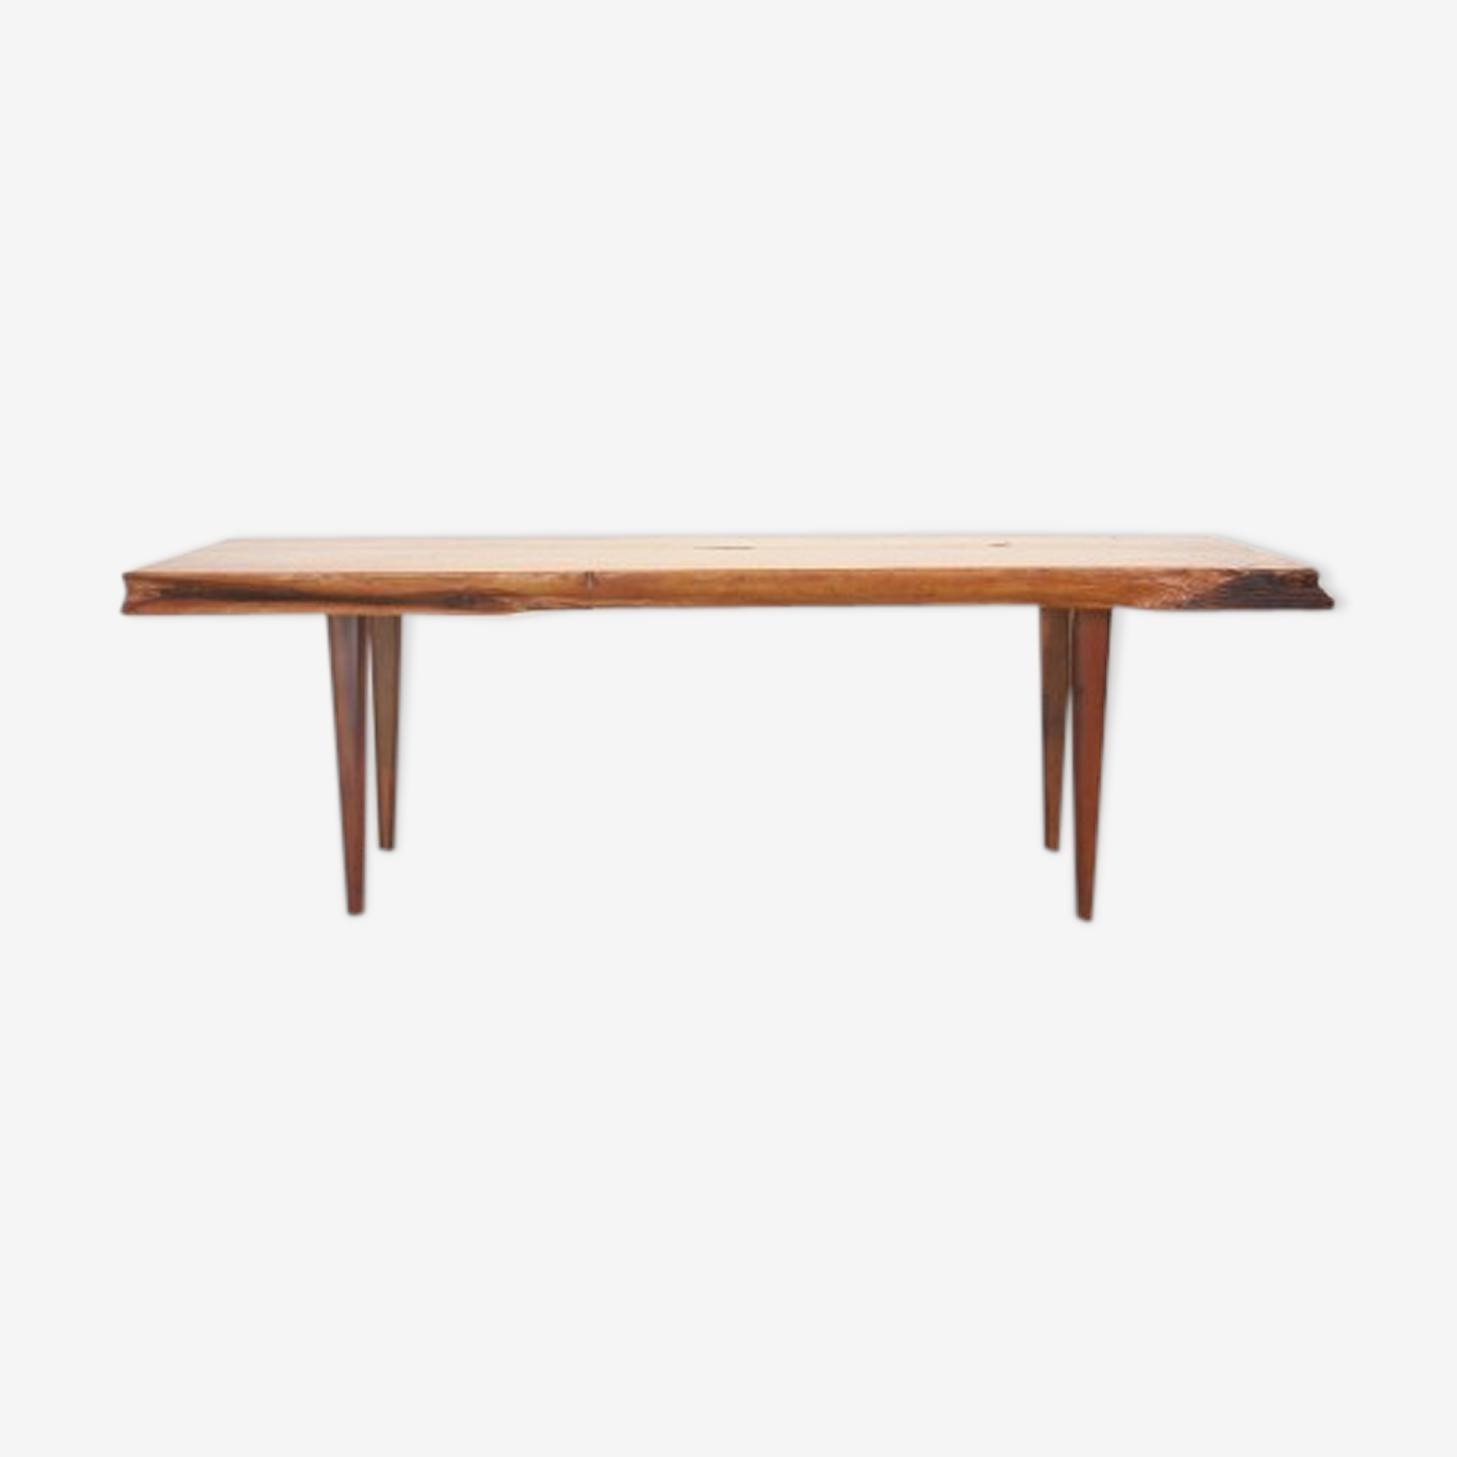 Table basse Reynolds de Ludlow Angleterre vers 1950-1960